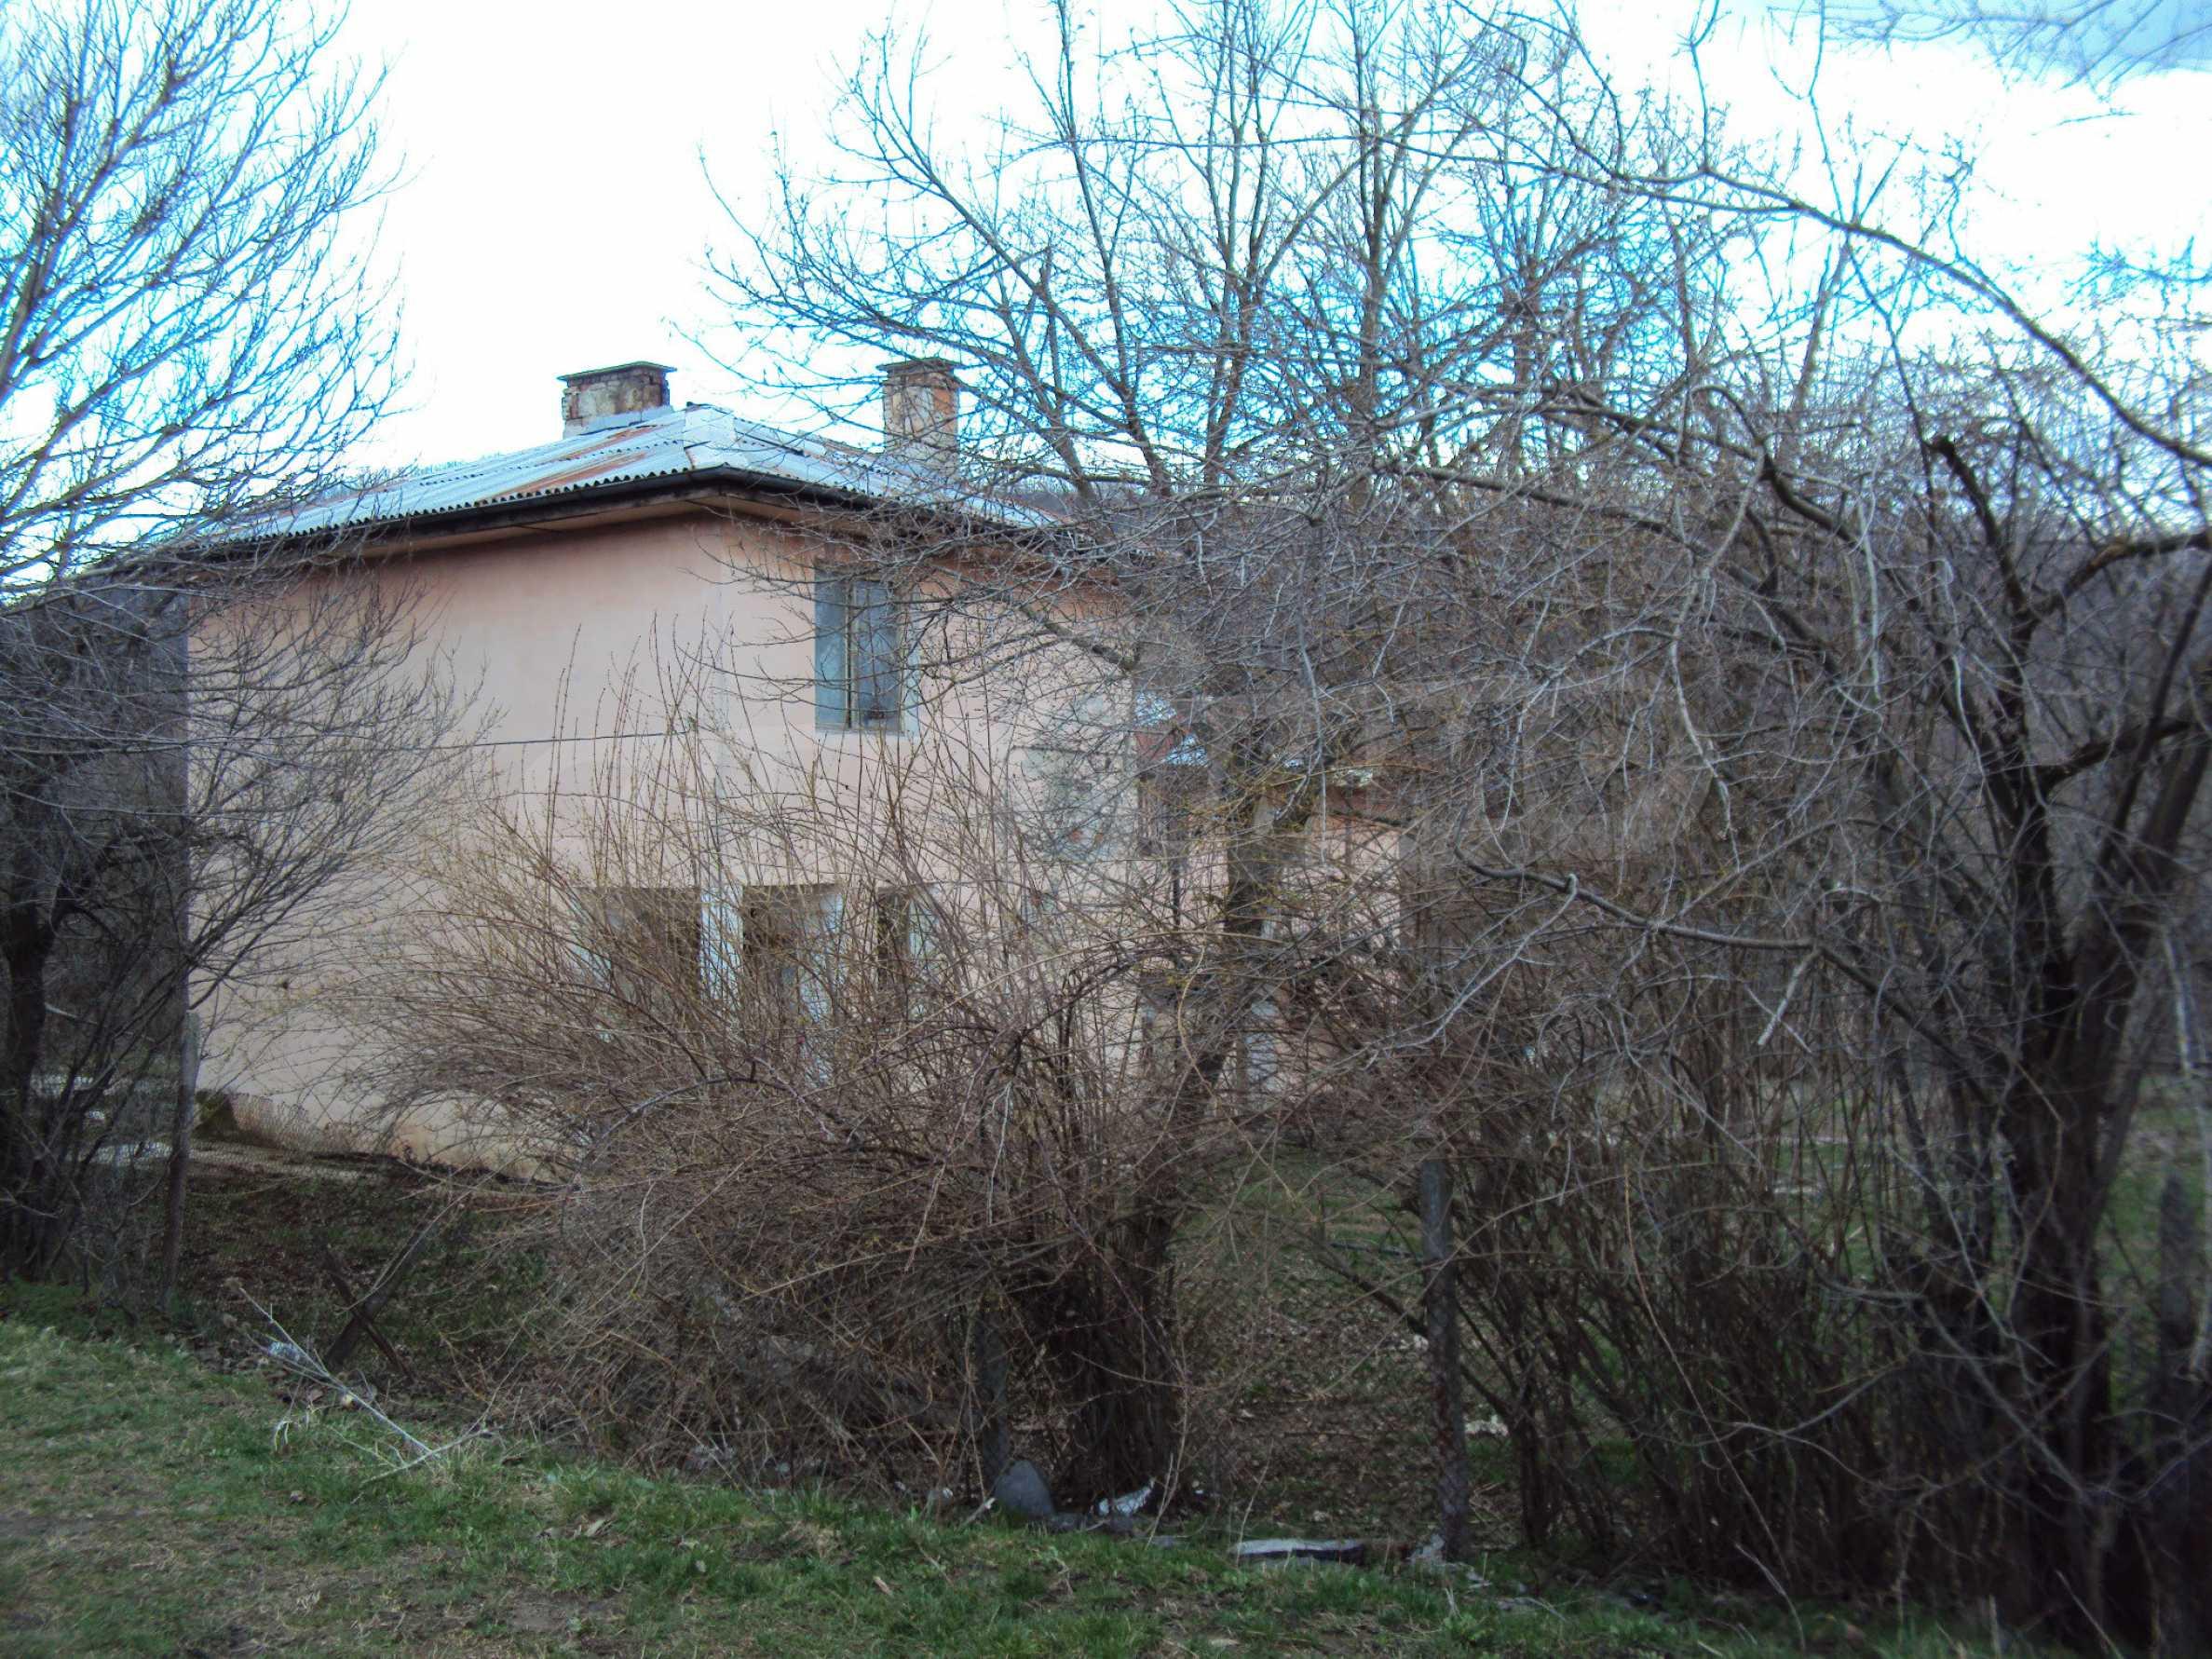 Farm in a small town 24 km from Veliko Tarnovo 8